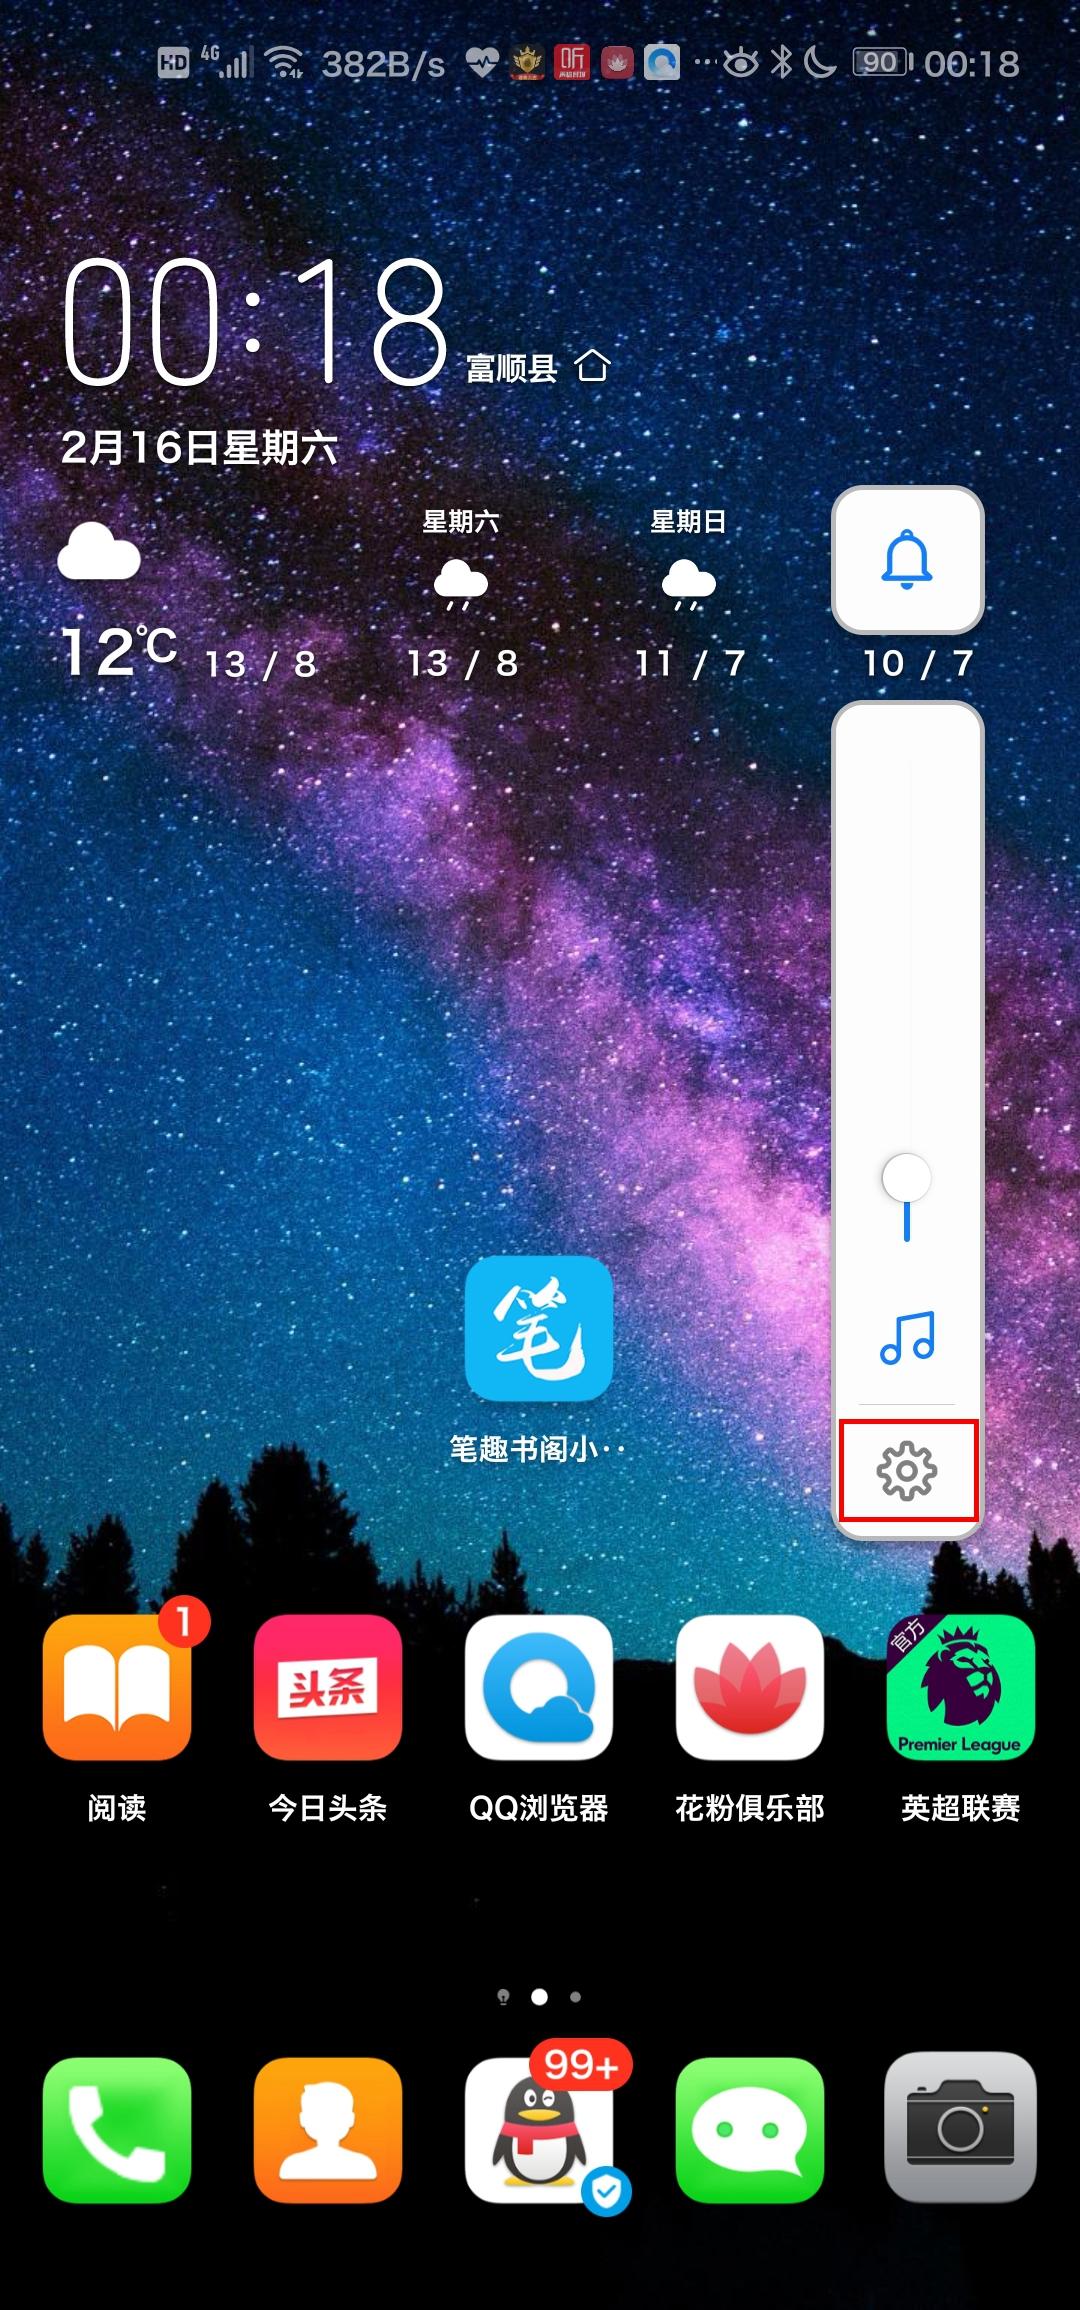 Screenshot_20190216_001836_com.huawei.android.lau.jpg